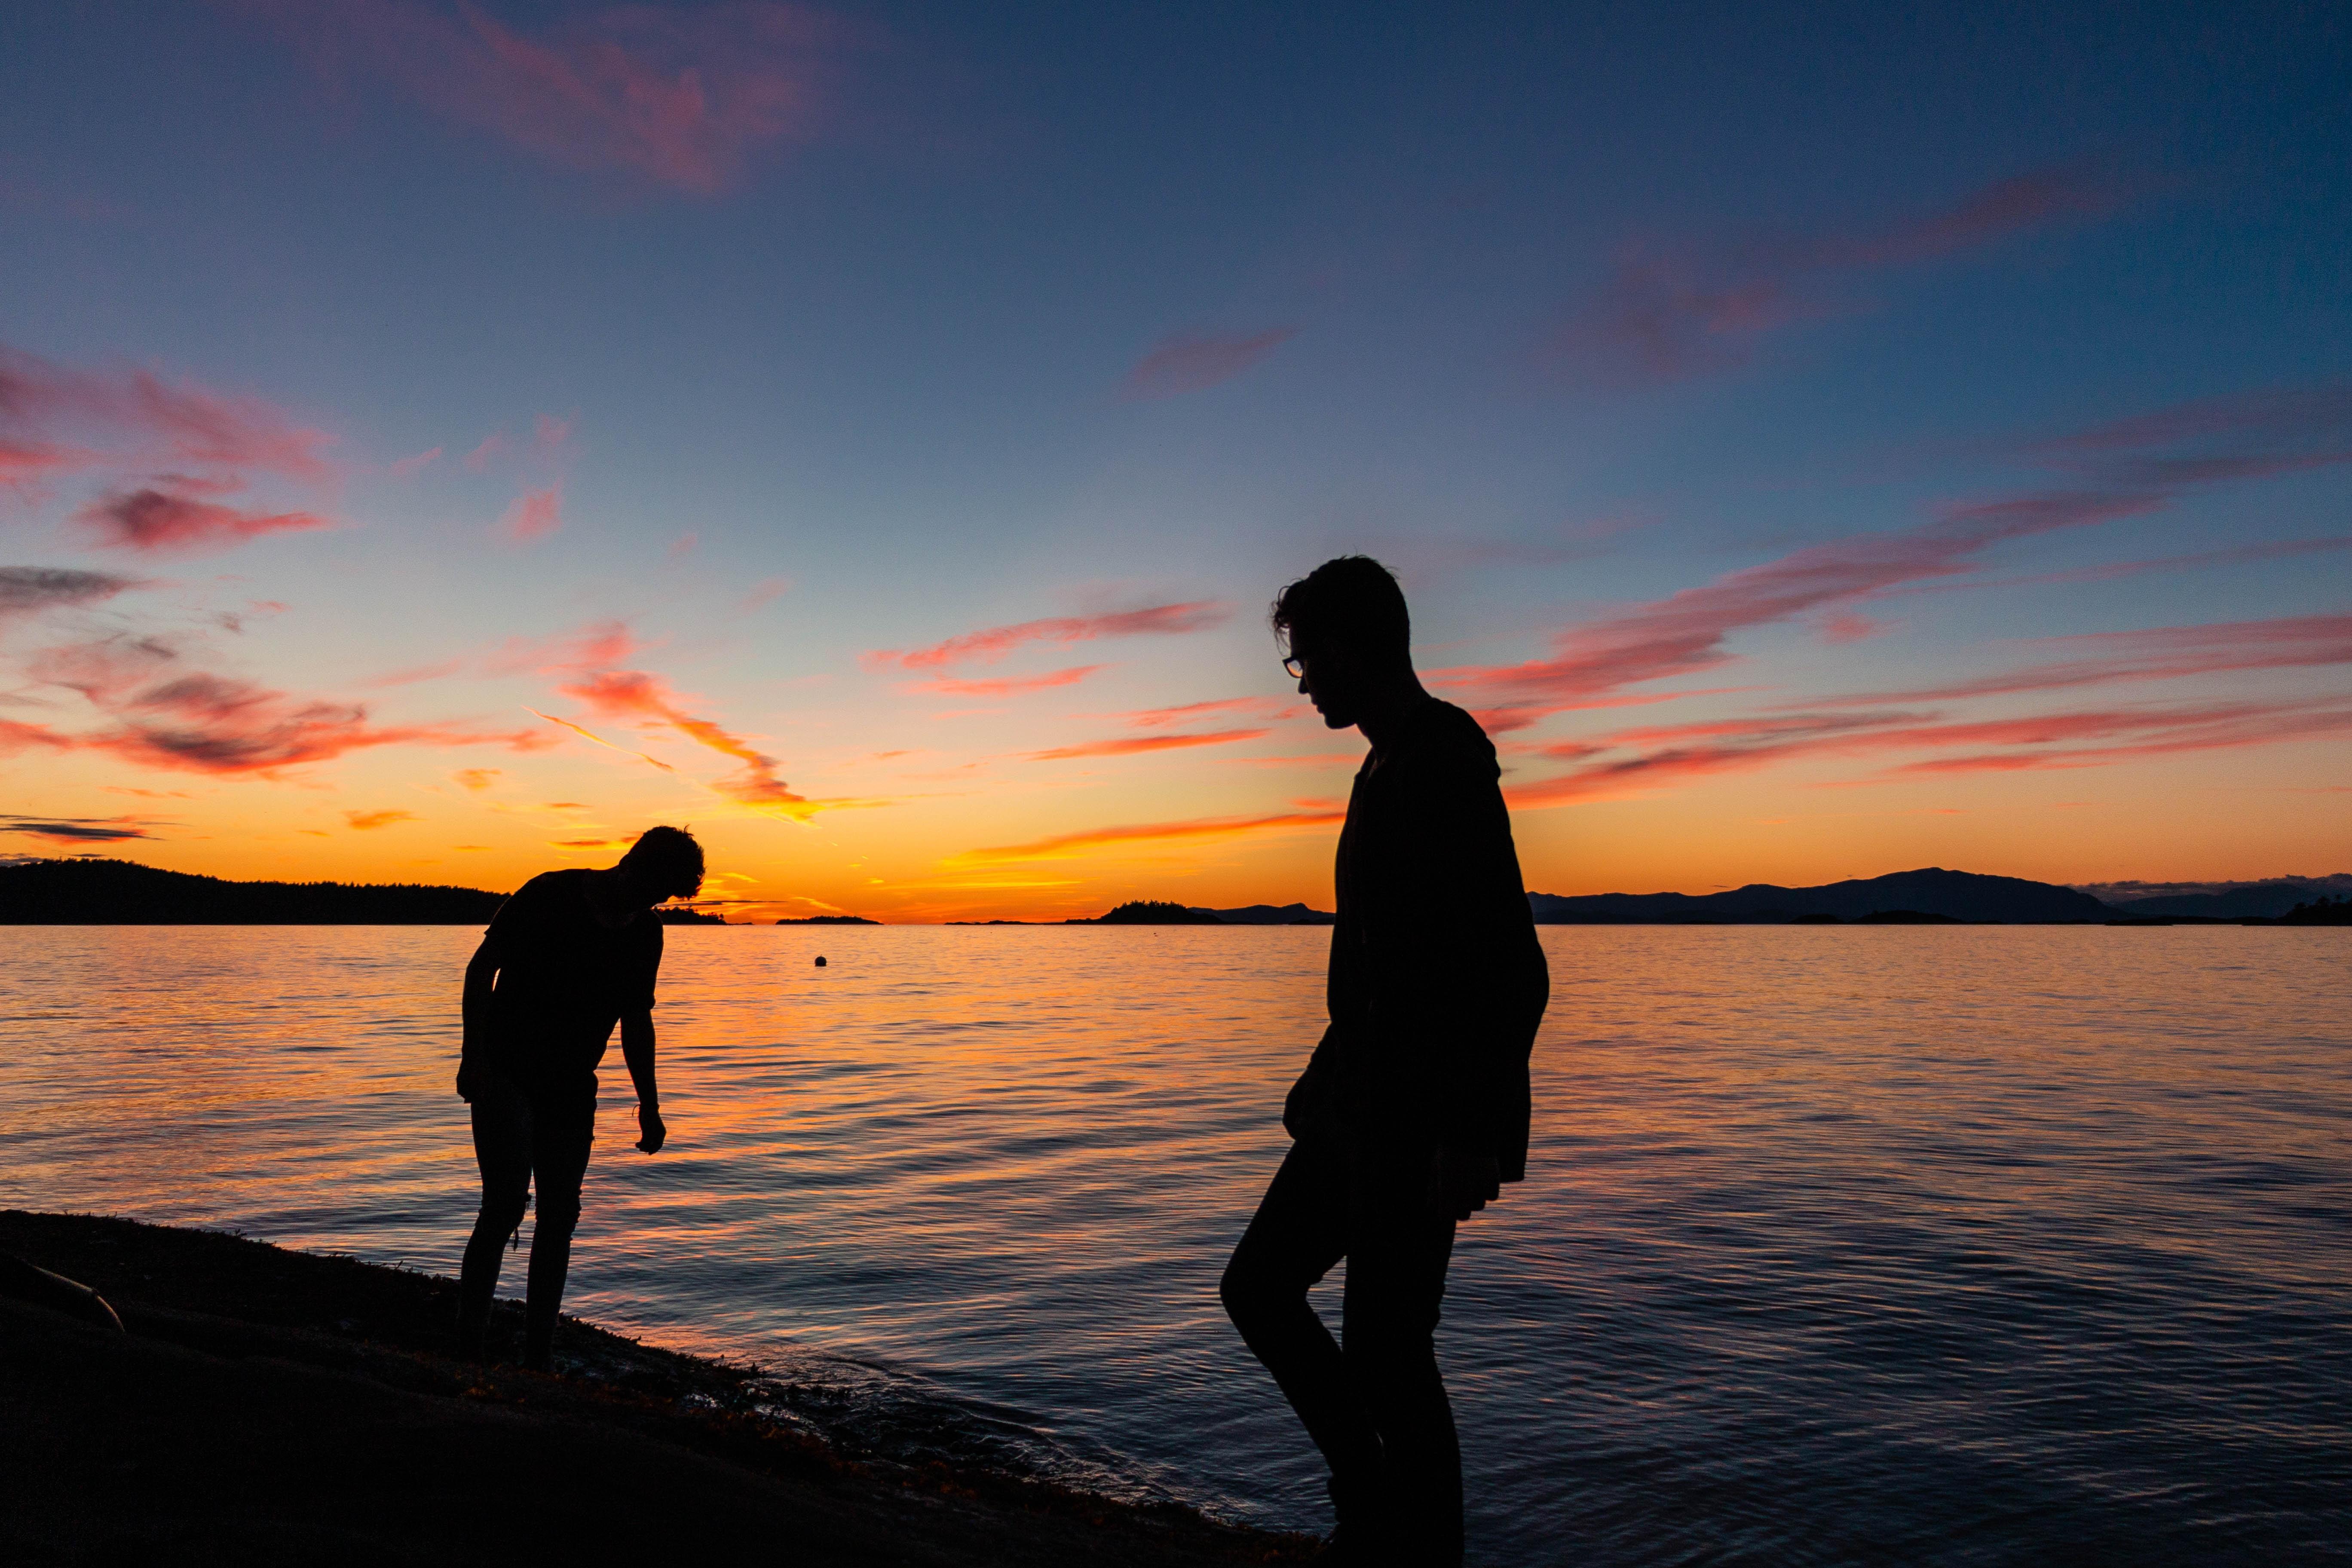 two men standing beside body of water